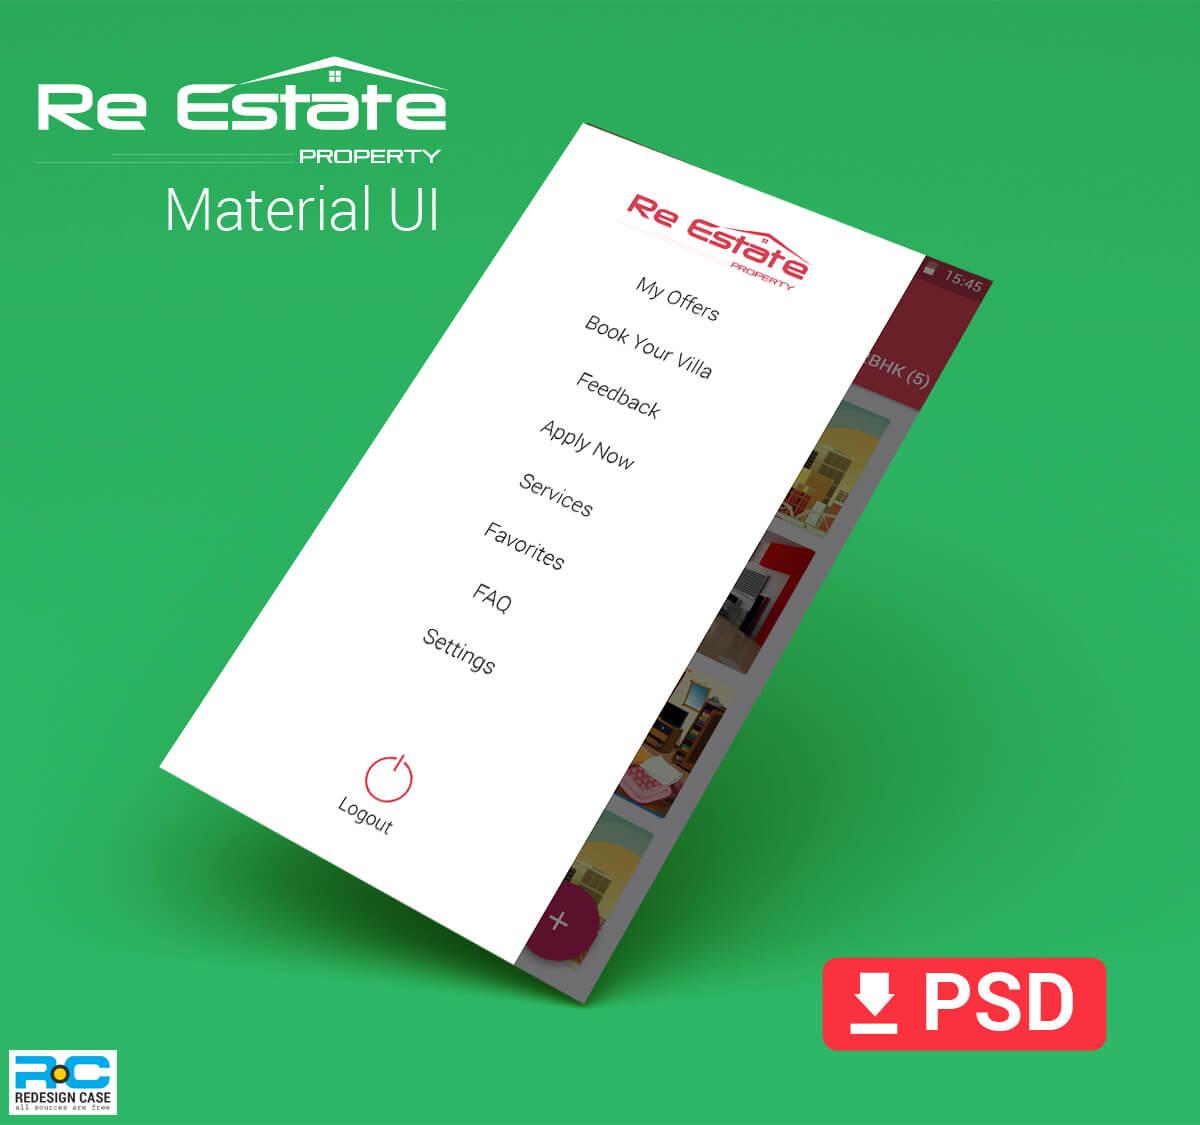 realEstate app material app design